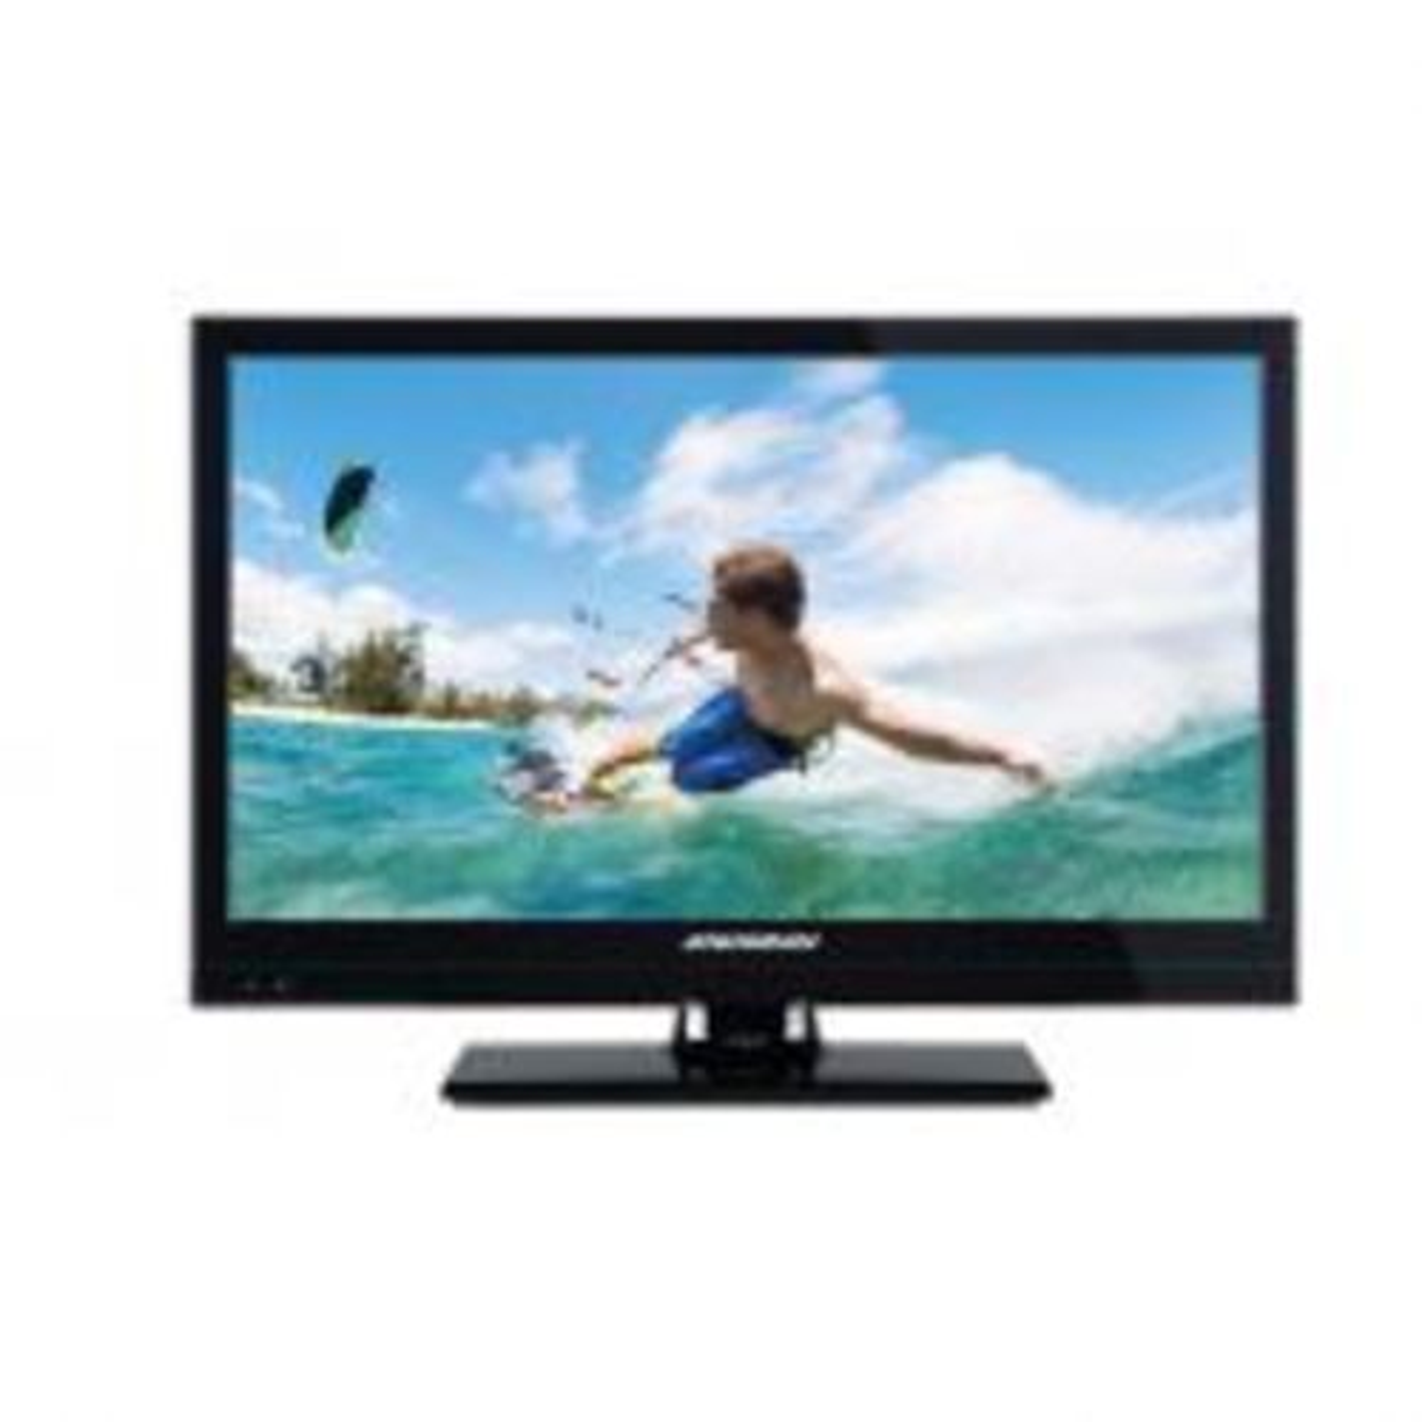 téléviseur led mpeg4 20\'\' (50 cm) digihome version dvd